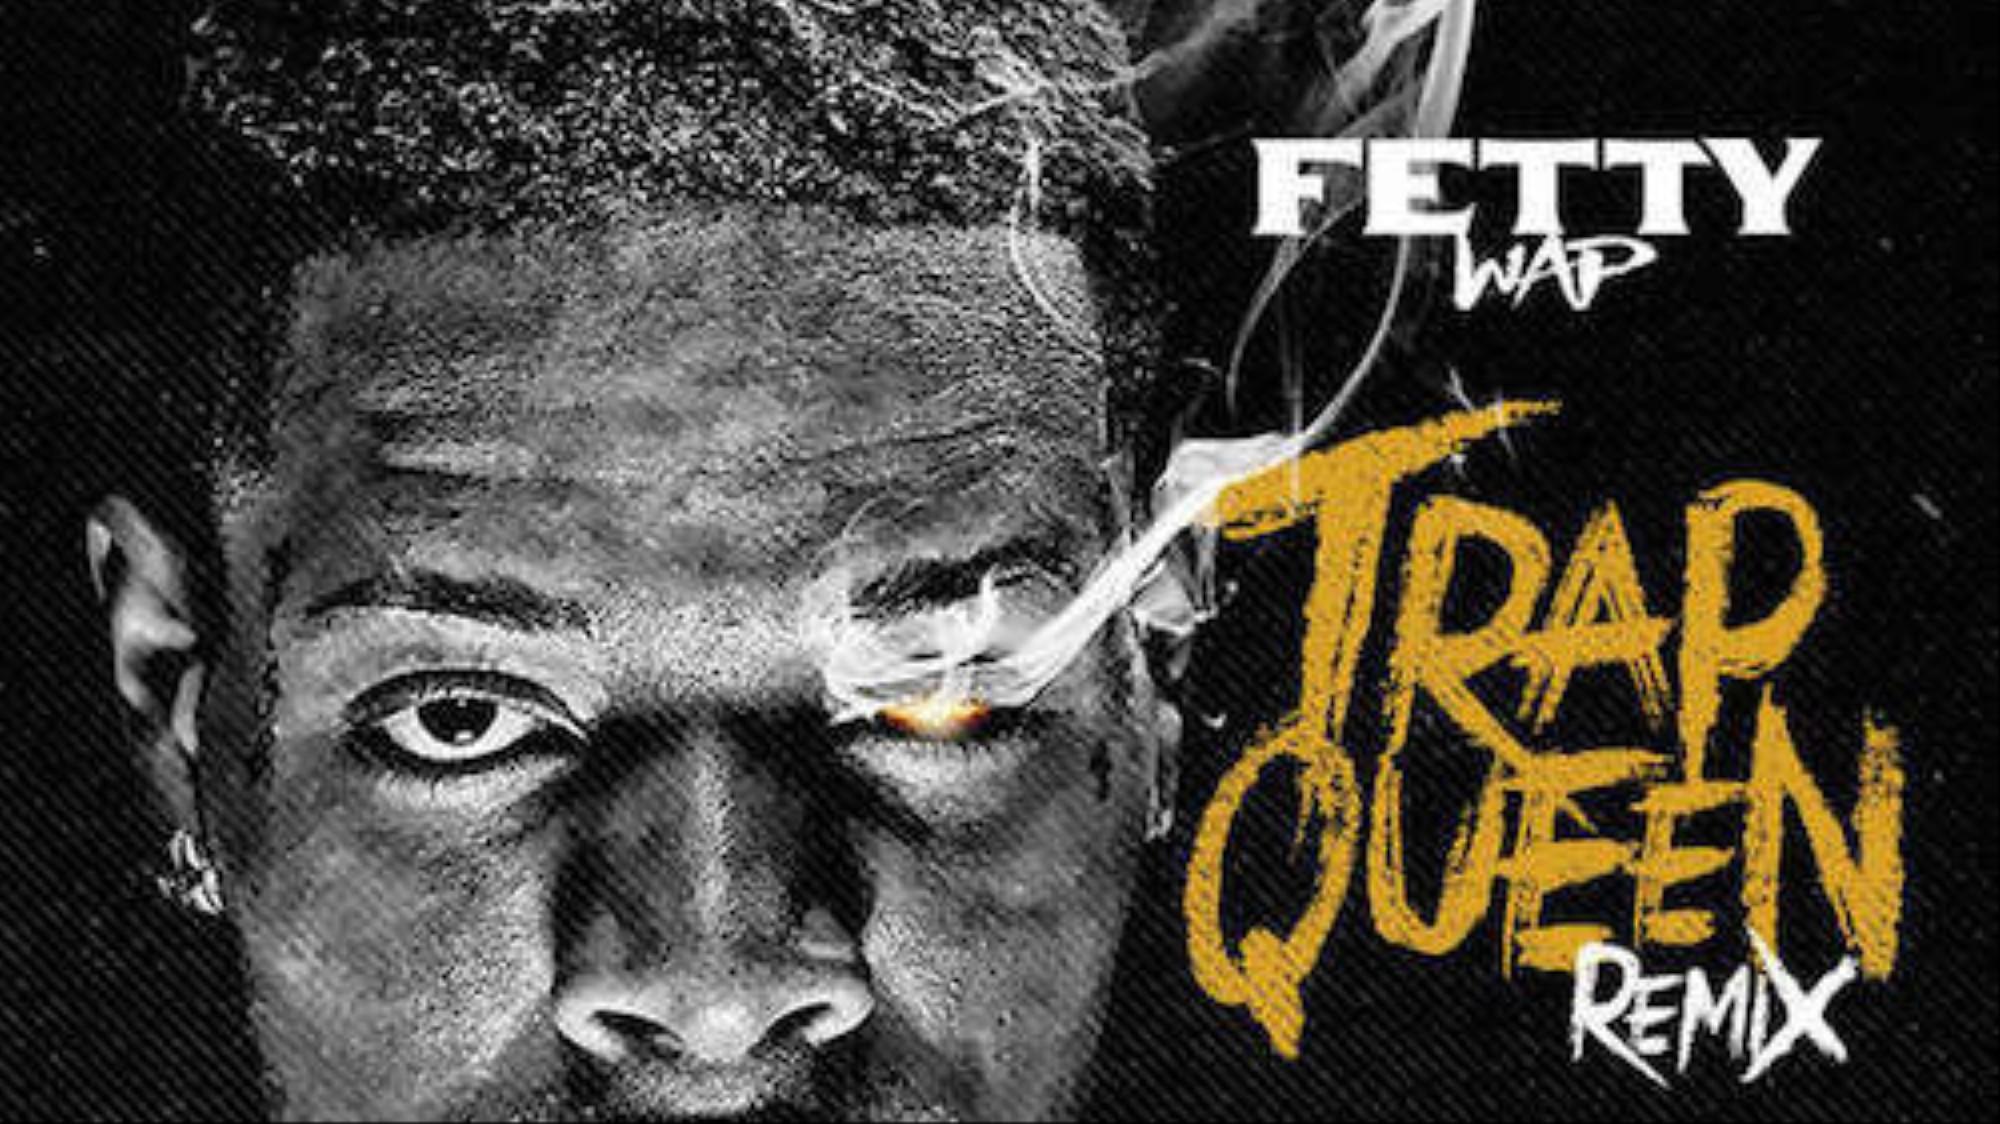 Fetty Wap Wins: Listen to Remixes Featuring Drake, Gucci